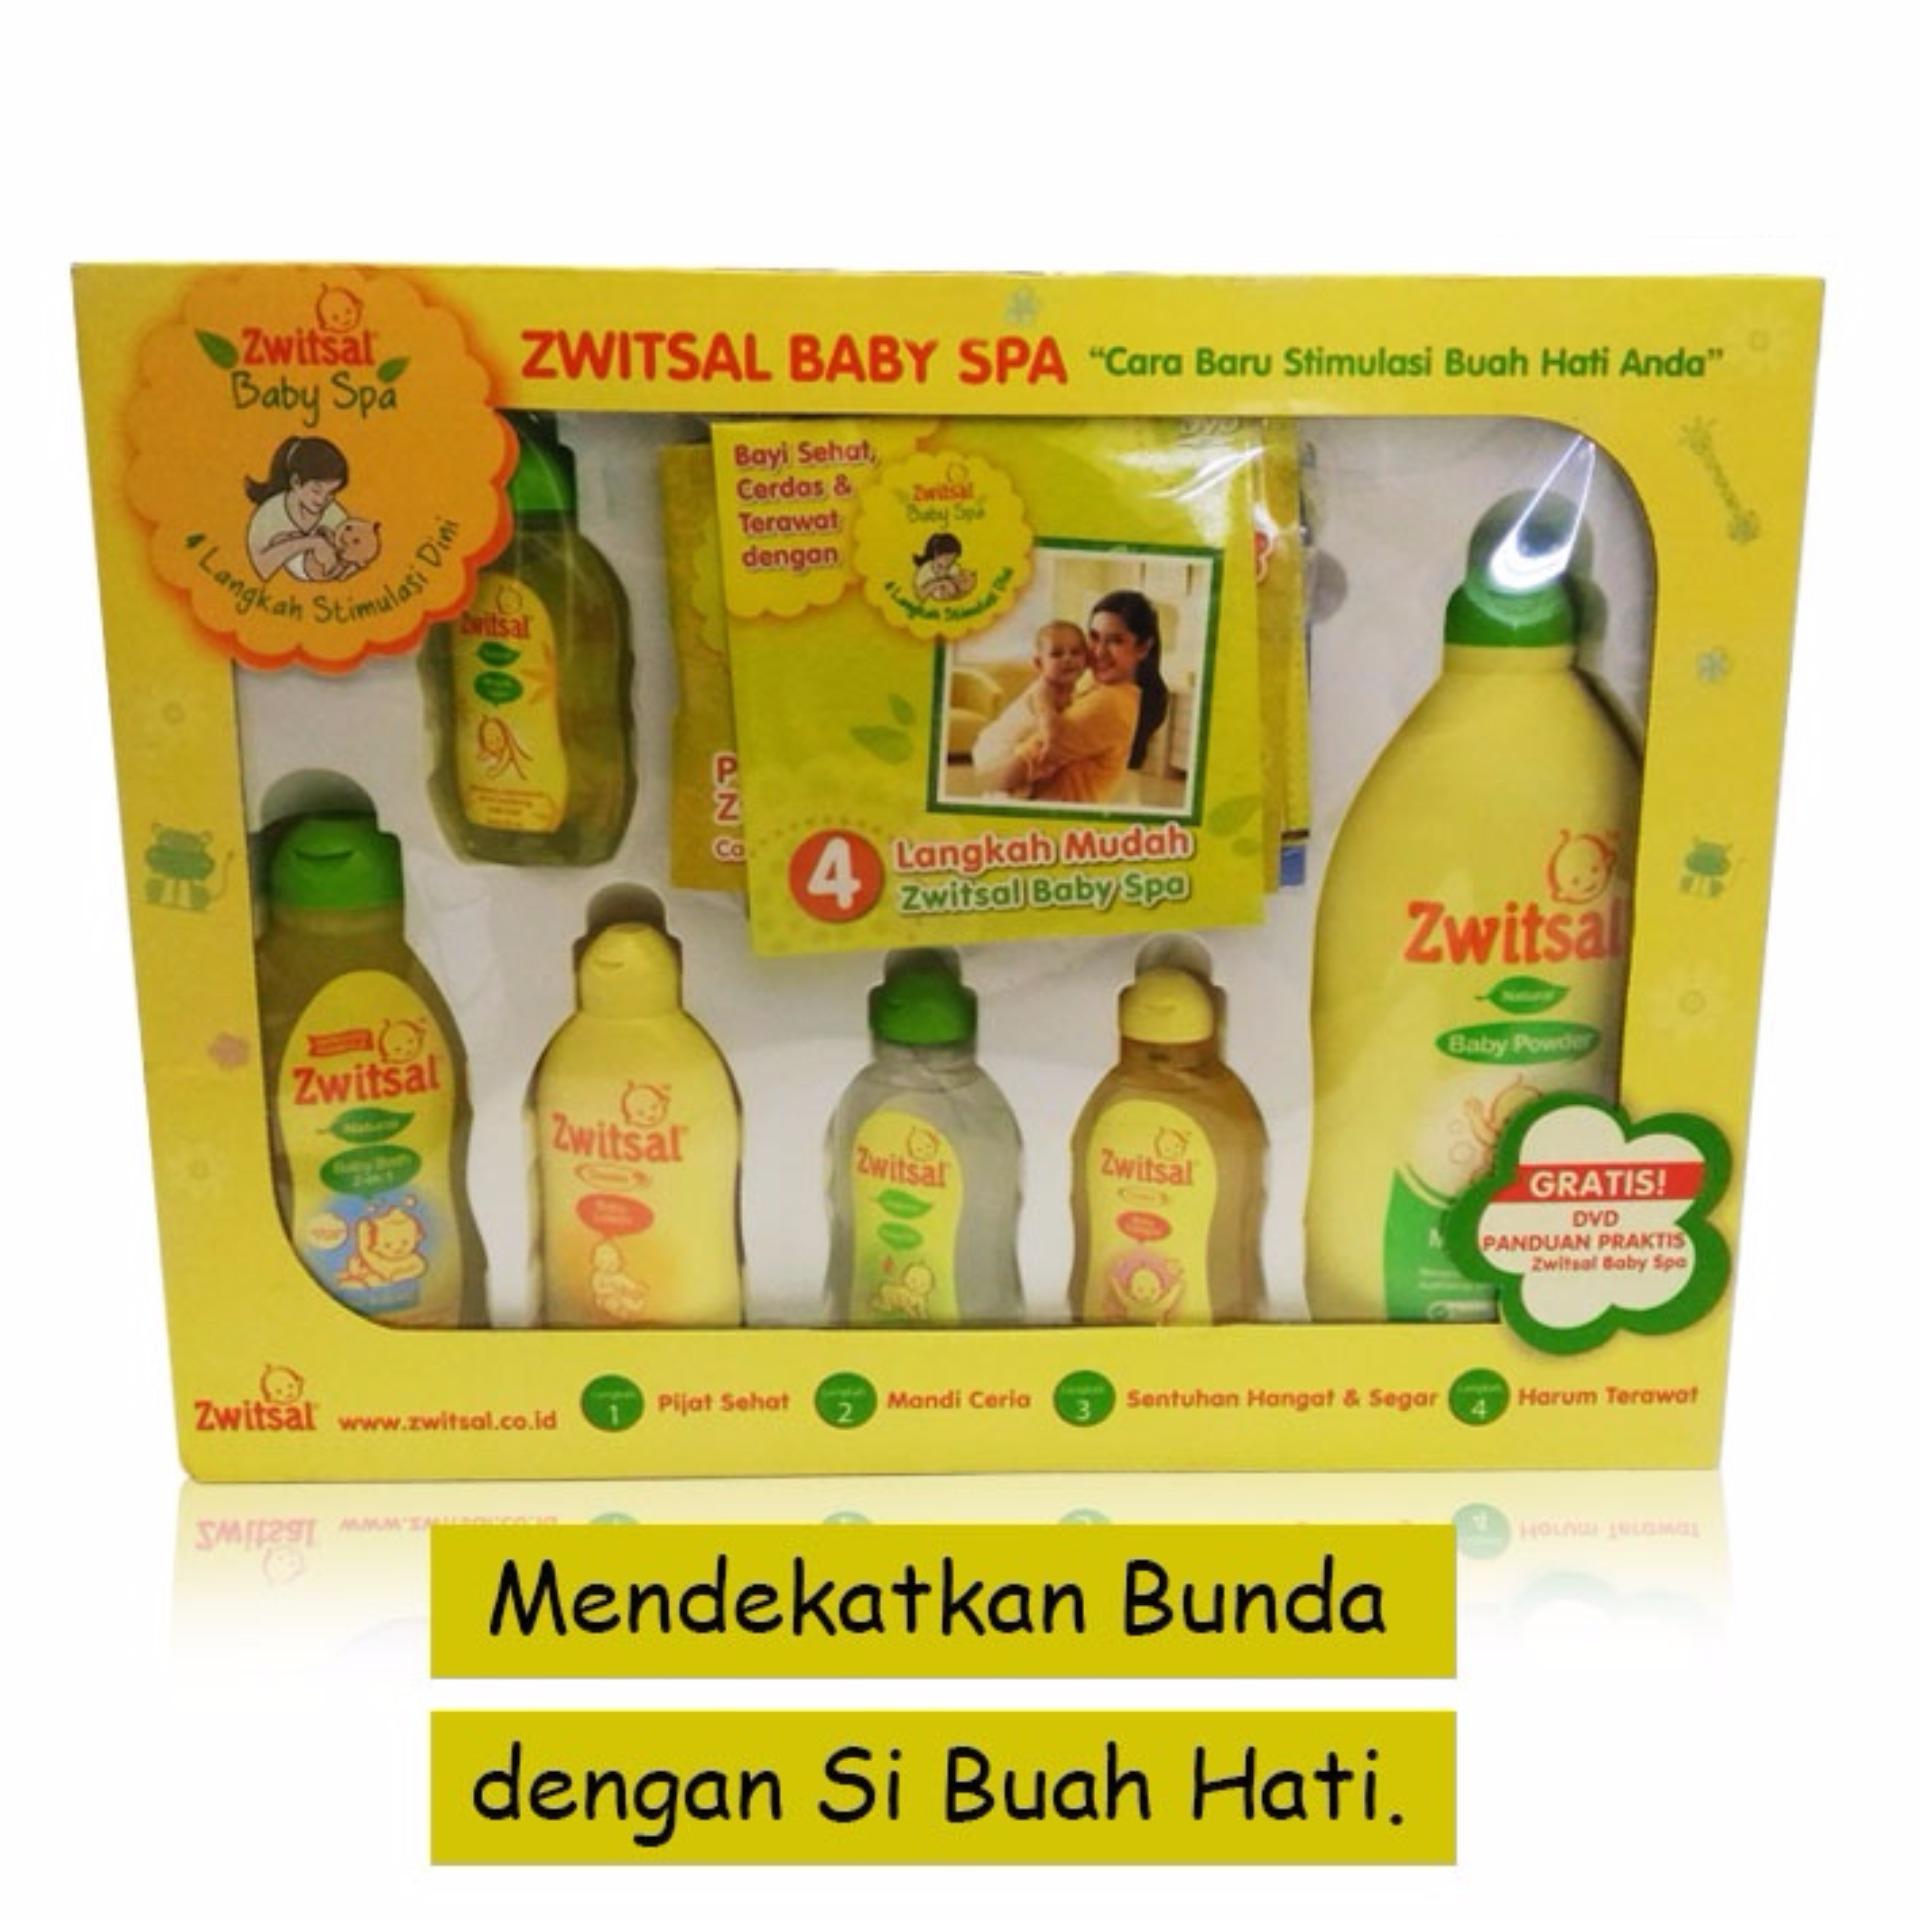 Harga Dan Spesifikasi Zwitsal Baby Cream Extra Care With Zinc 100ml Twin Pack 100 Ml Murah Travel Toko Perlengkapan Bayi Ibu Hamil